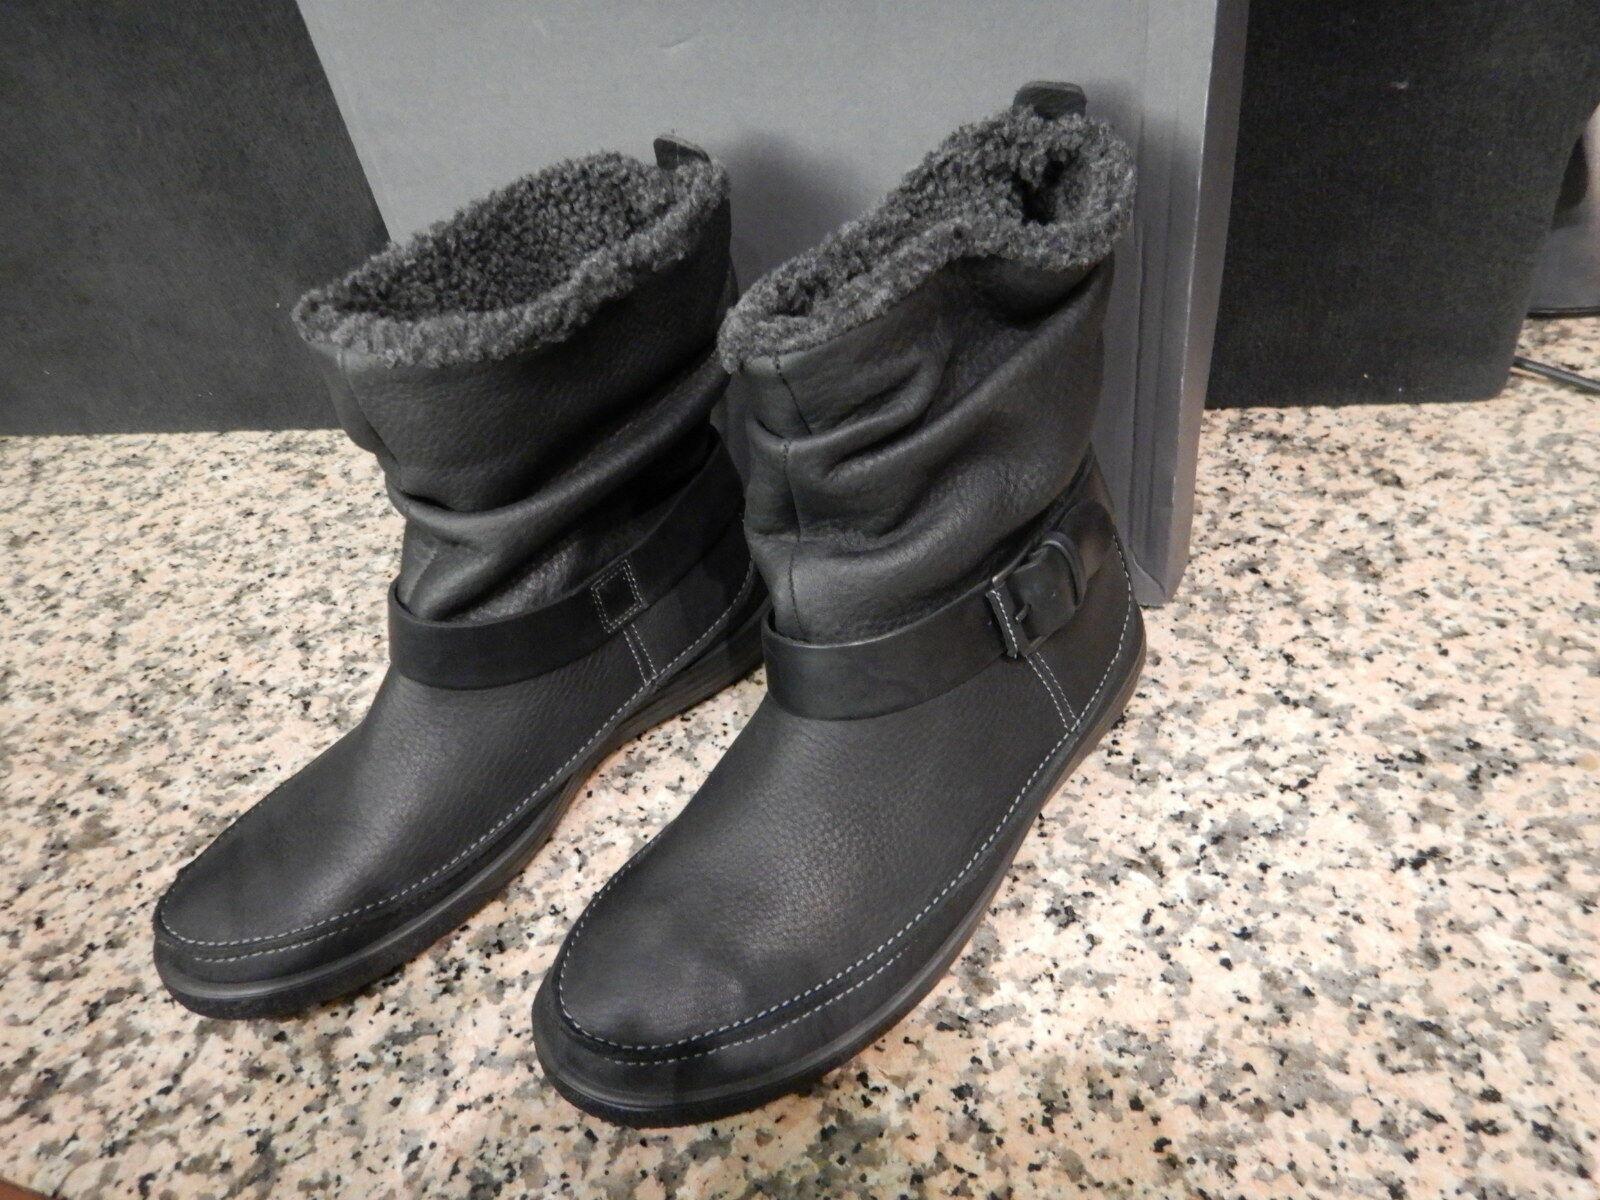 Ecco Damen-Winterstiefel CHASE II Leder schwarz Gr. 37